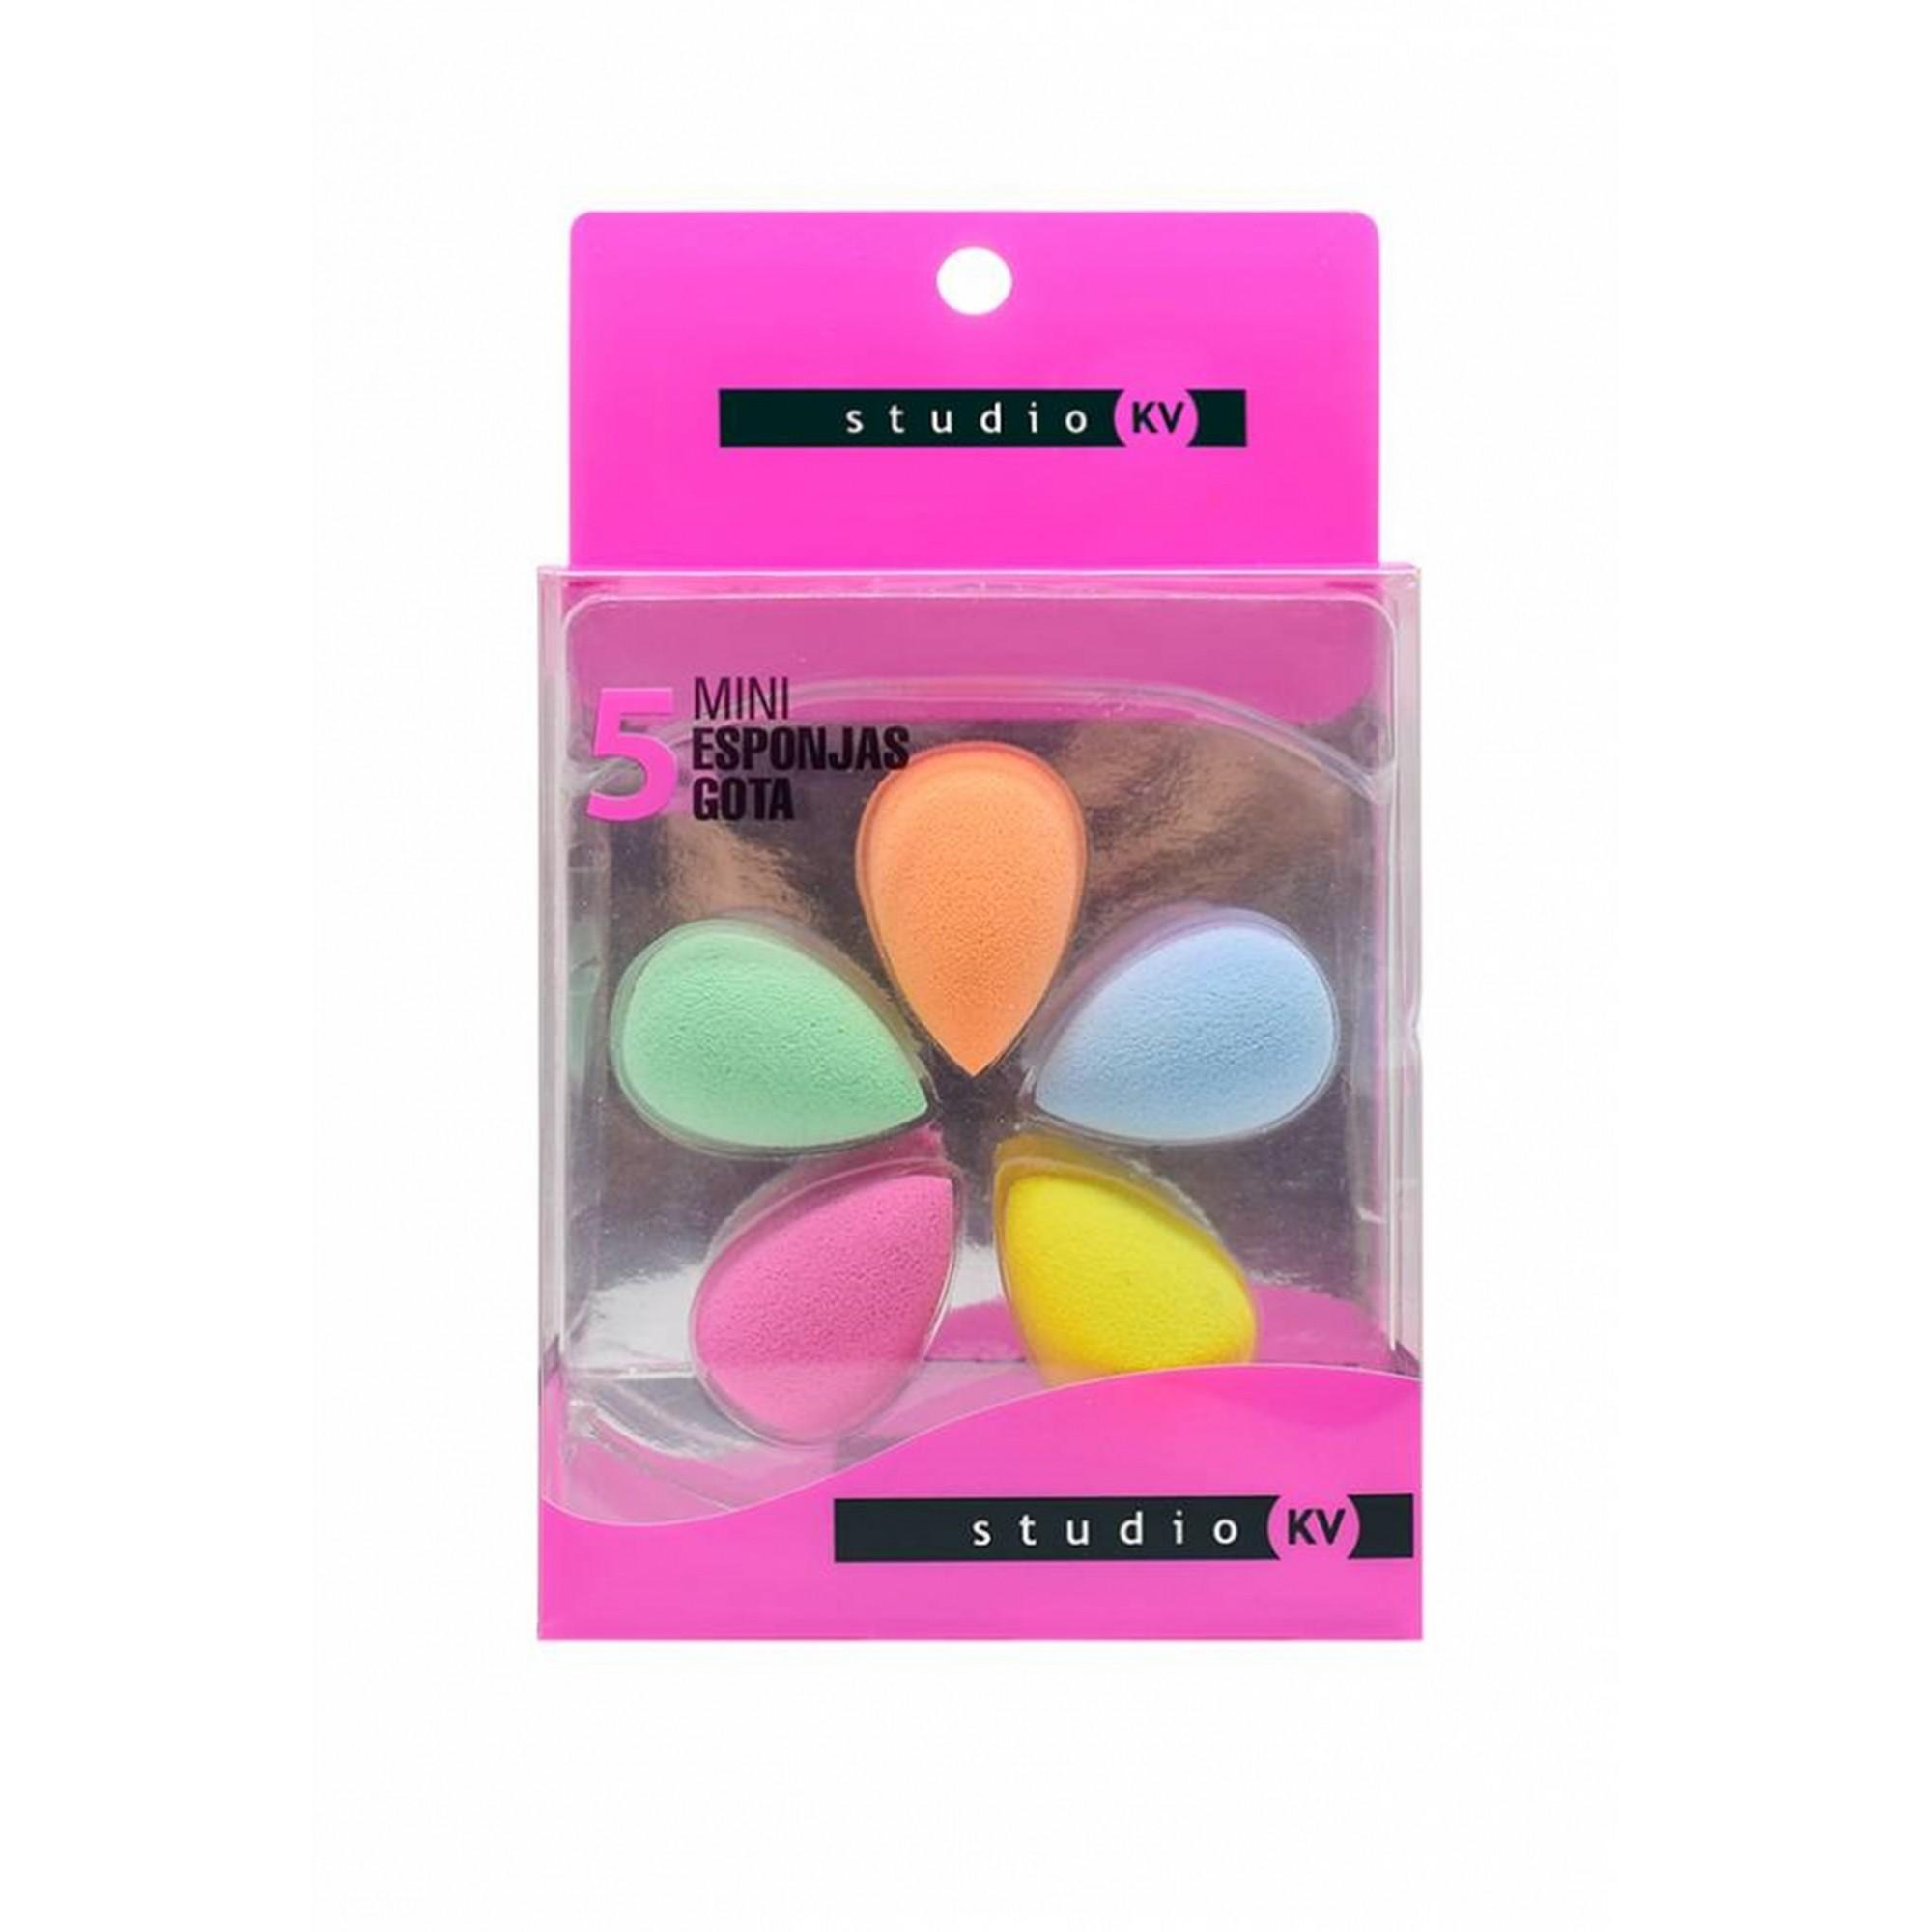 Mini 5 Esponja Gota Para Maquiagem - Klass Vough